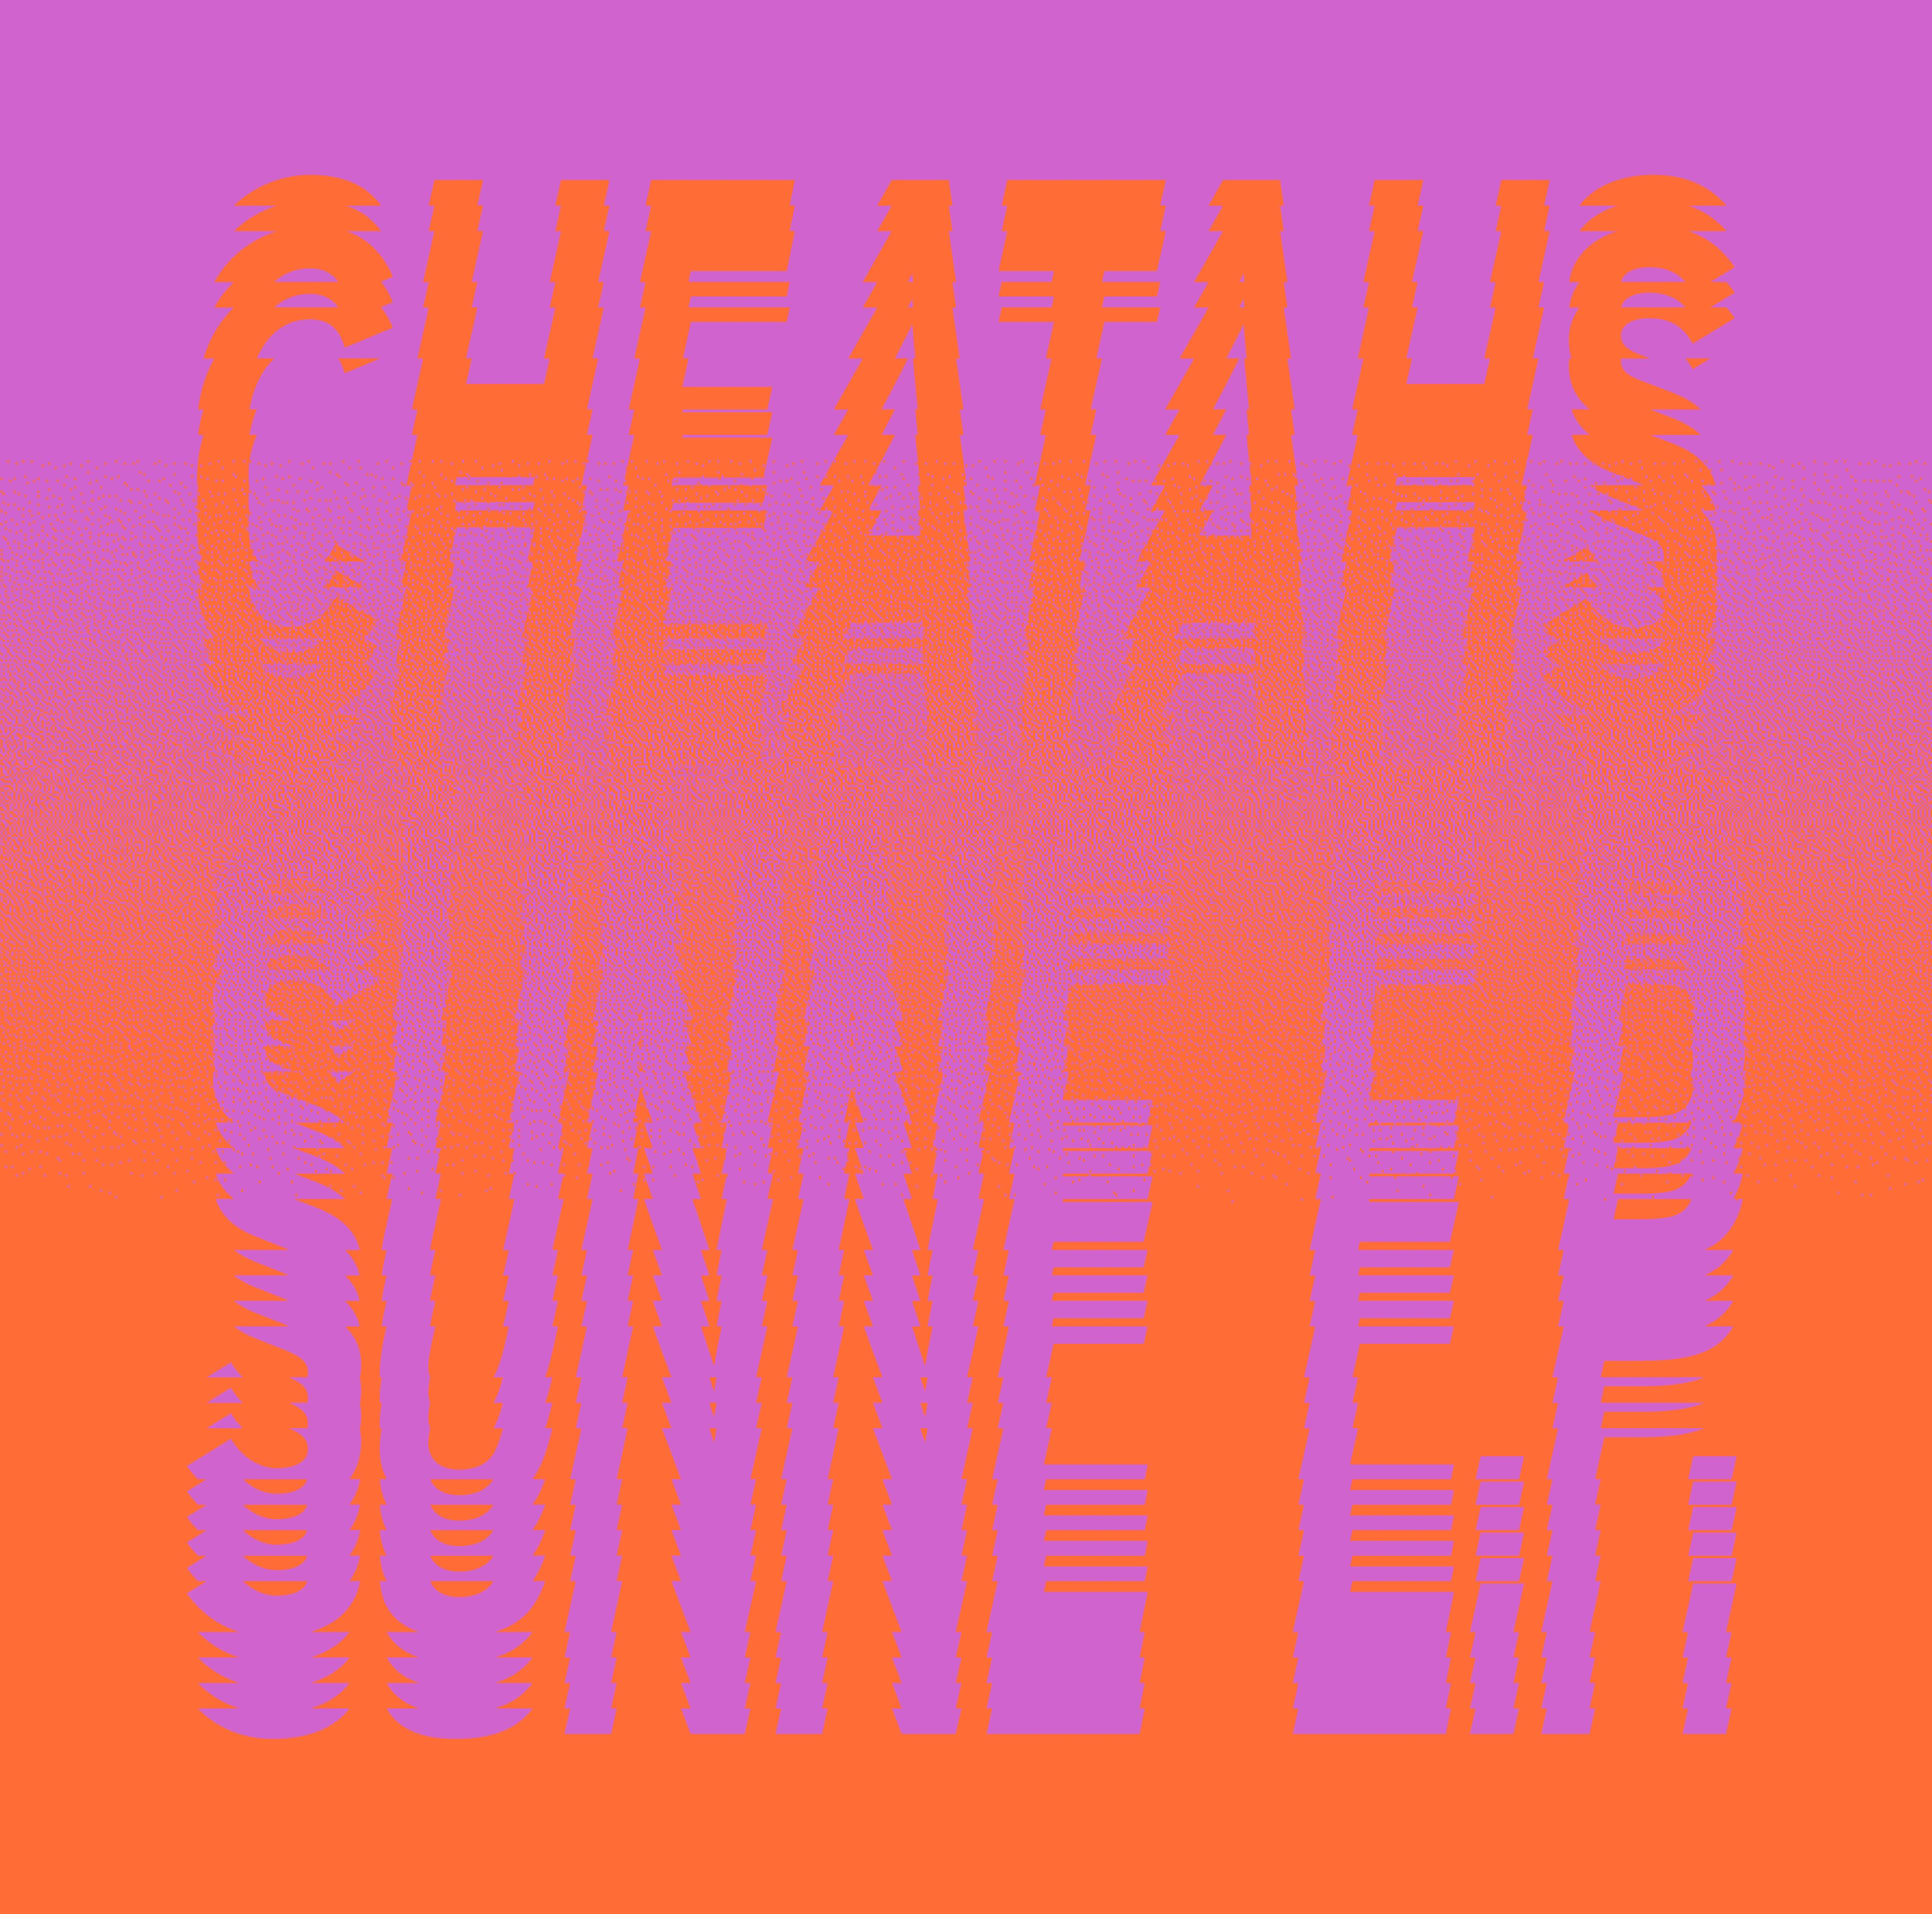 Cheatahs 6 x Vinyl Bundle